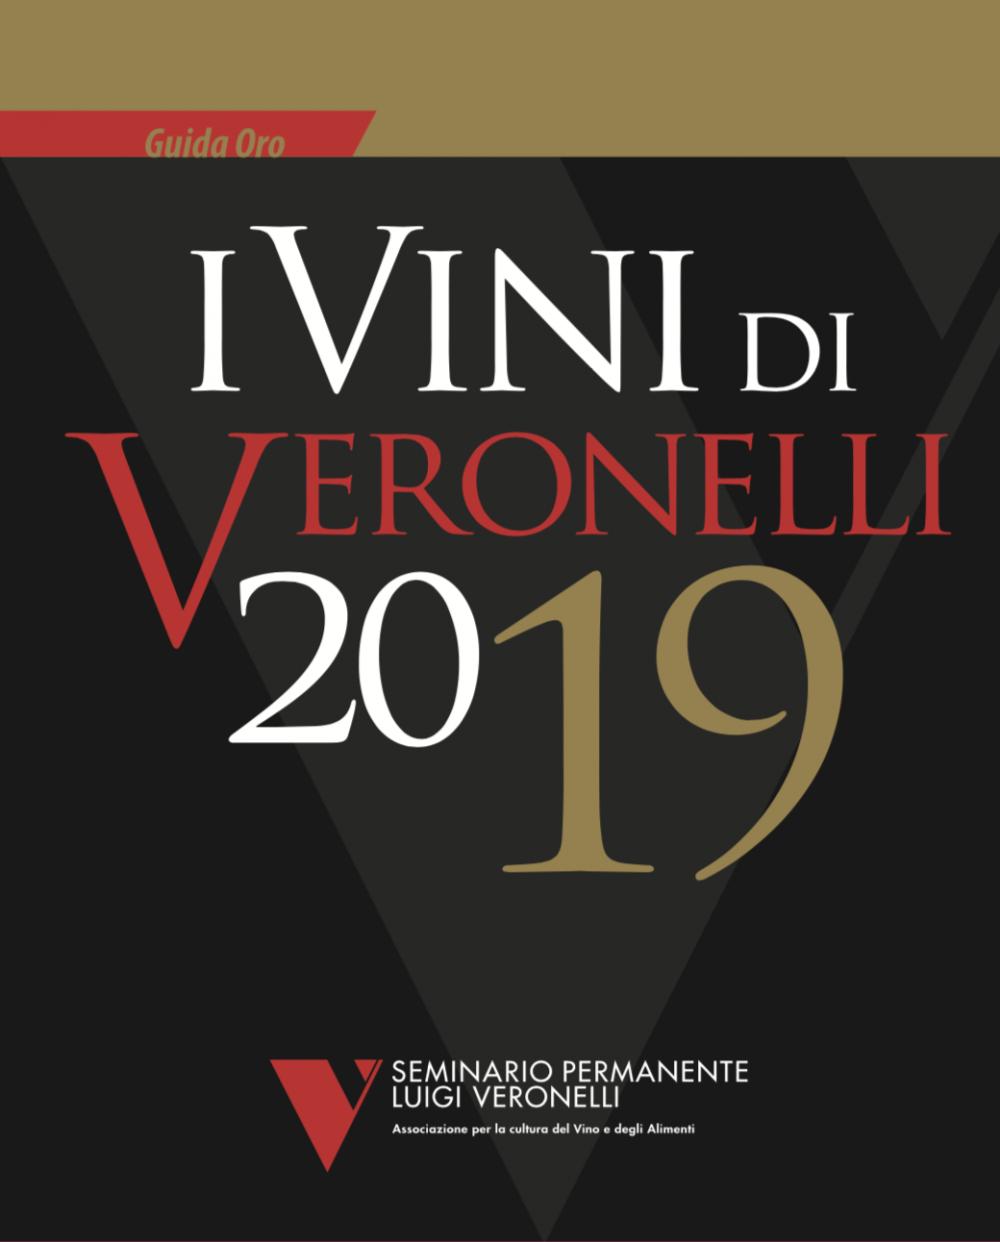 VERONELLI 2019